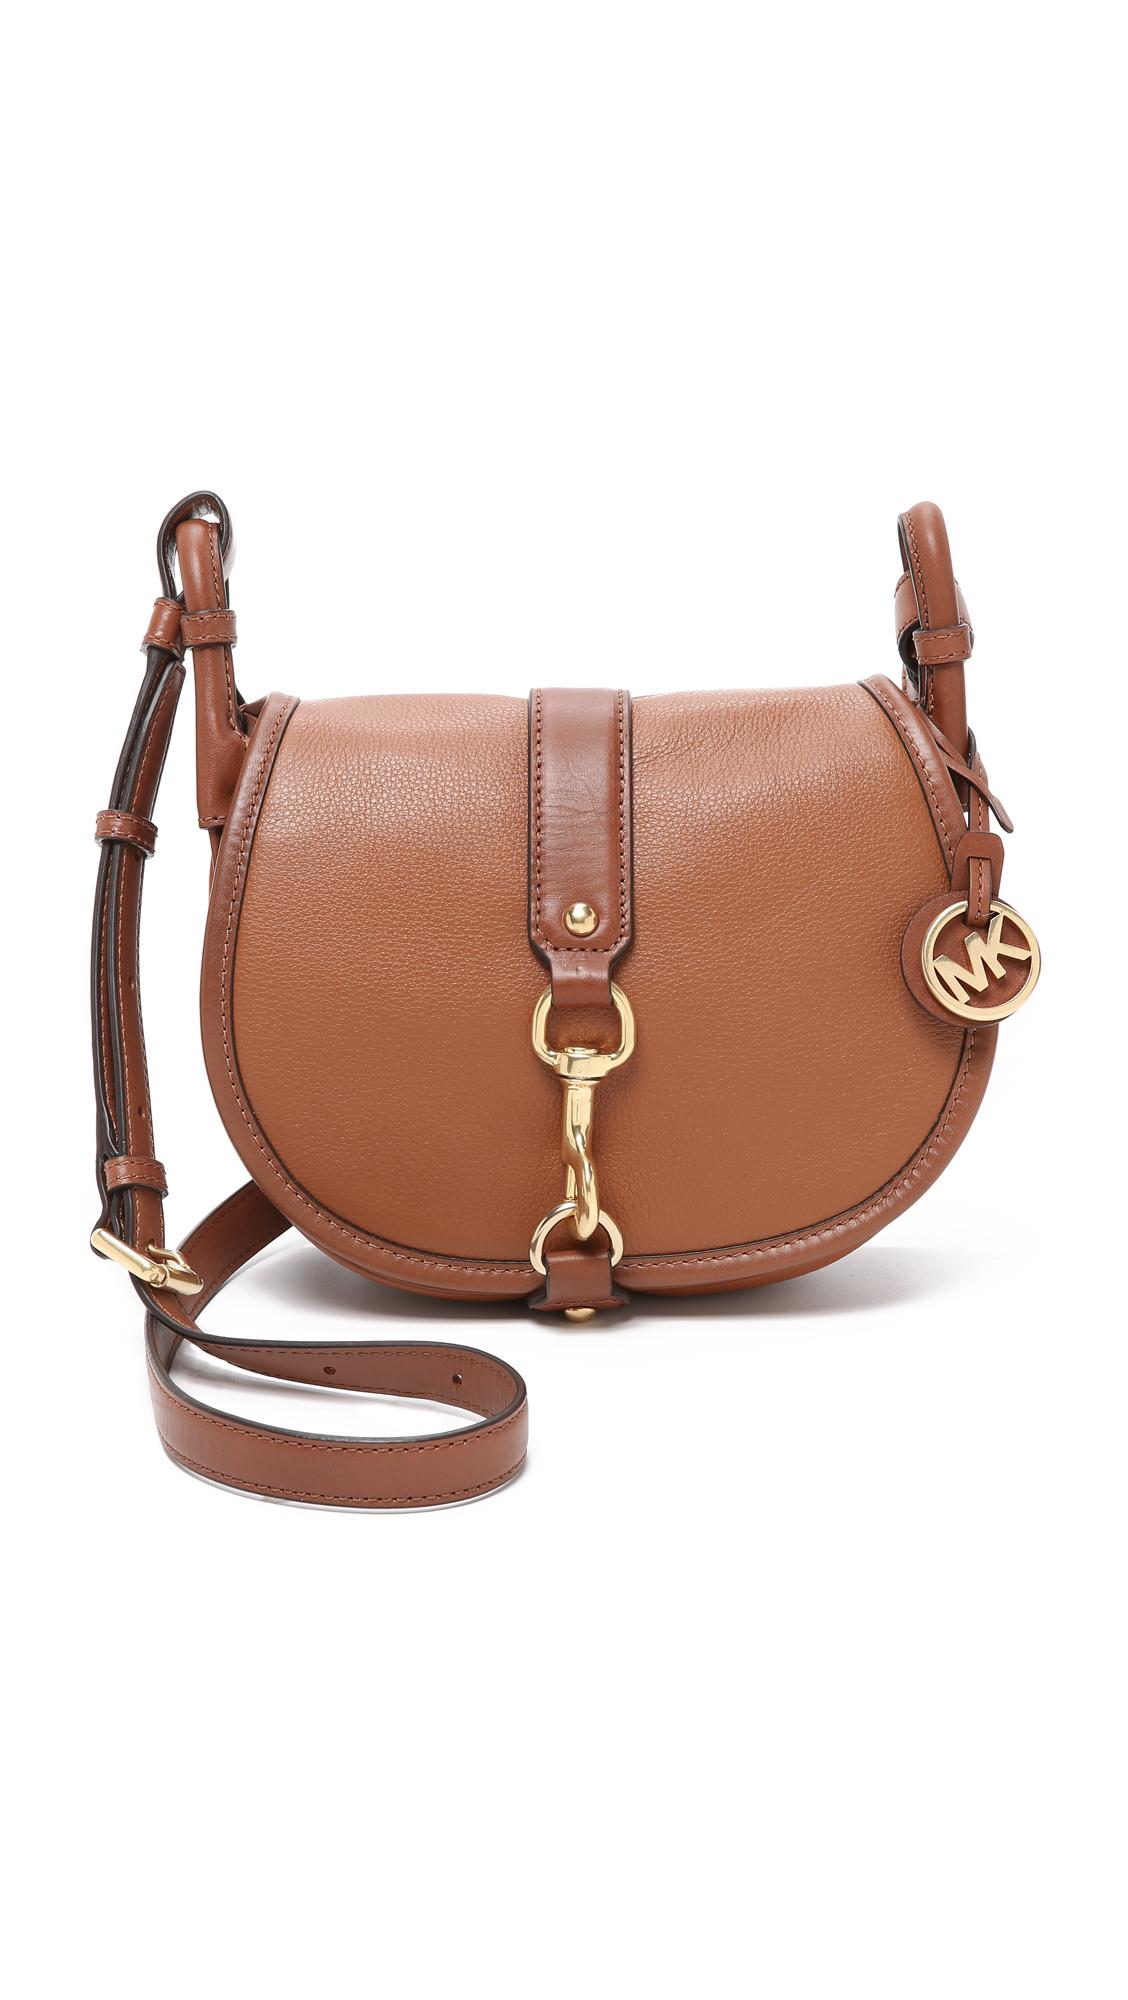 b267ea0cffe Lyst - MICHAEL Michael Kors Jamie Saddle Bag in Brown